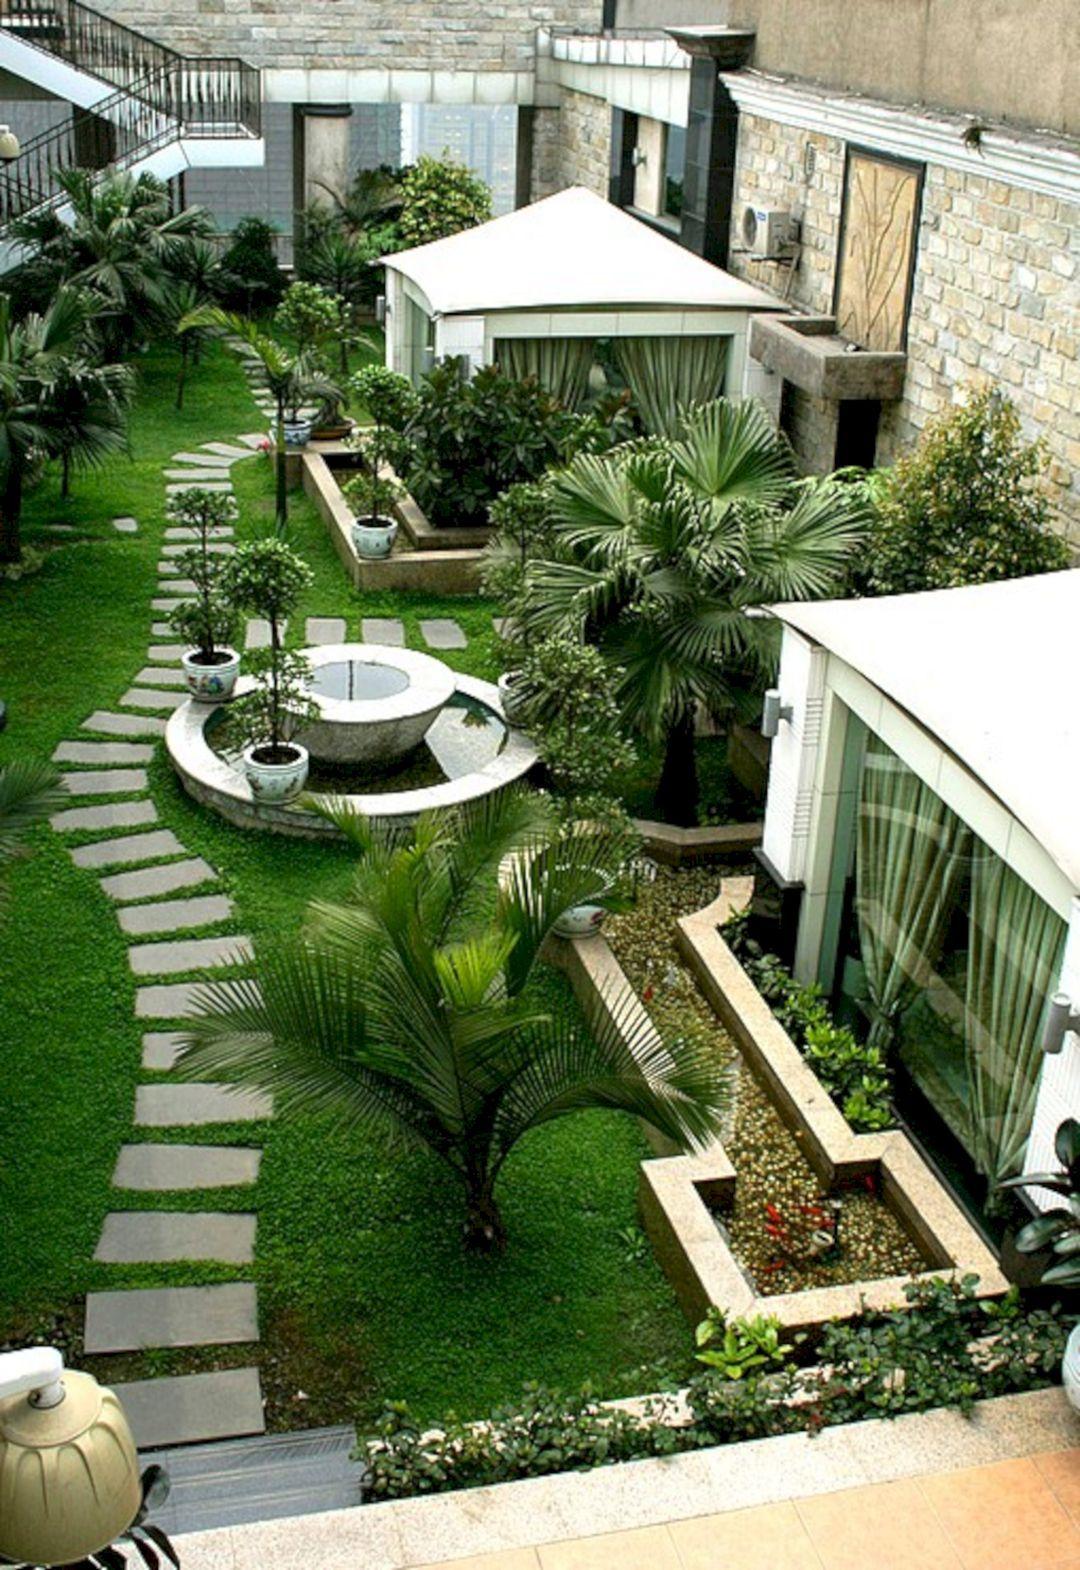 Outstanding Amazing 10 Rooftop Garden Ideas For Alternative Gardening On A Budget Https Decoredo Urban Garden Design Roof Garden Design Pathway Landscaping